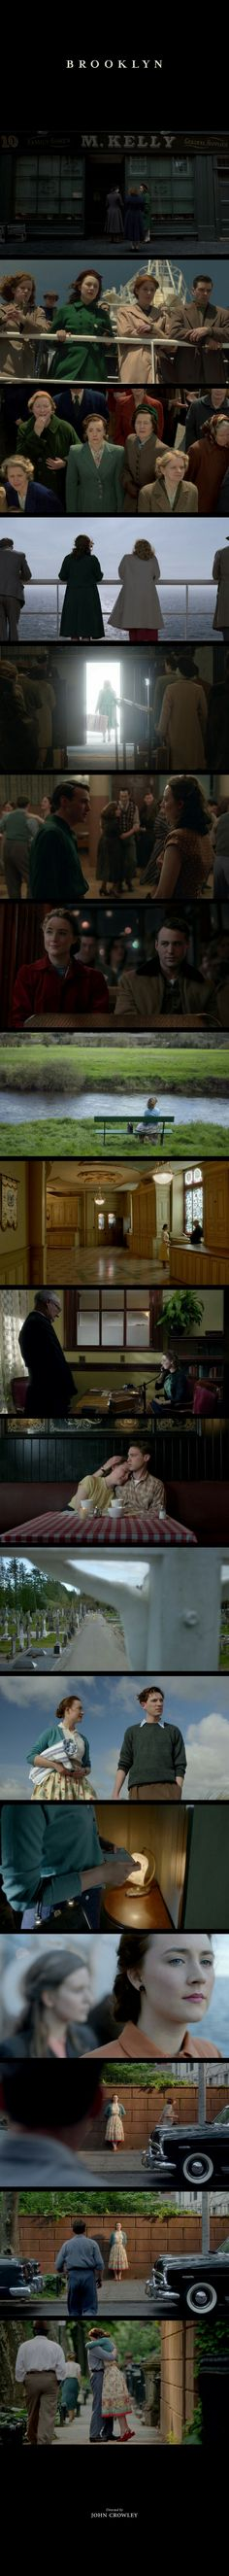 Brooklyn (2015) Directed by John Crowley.